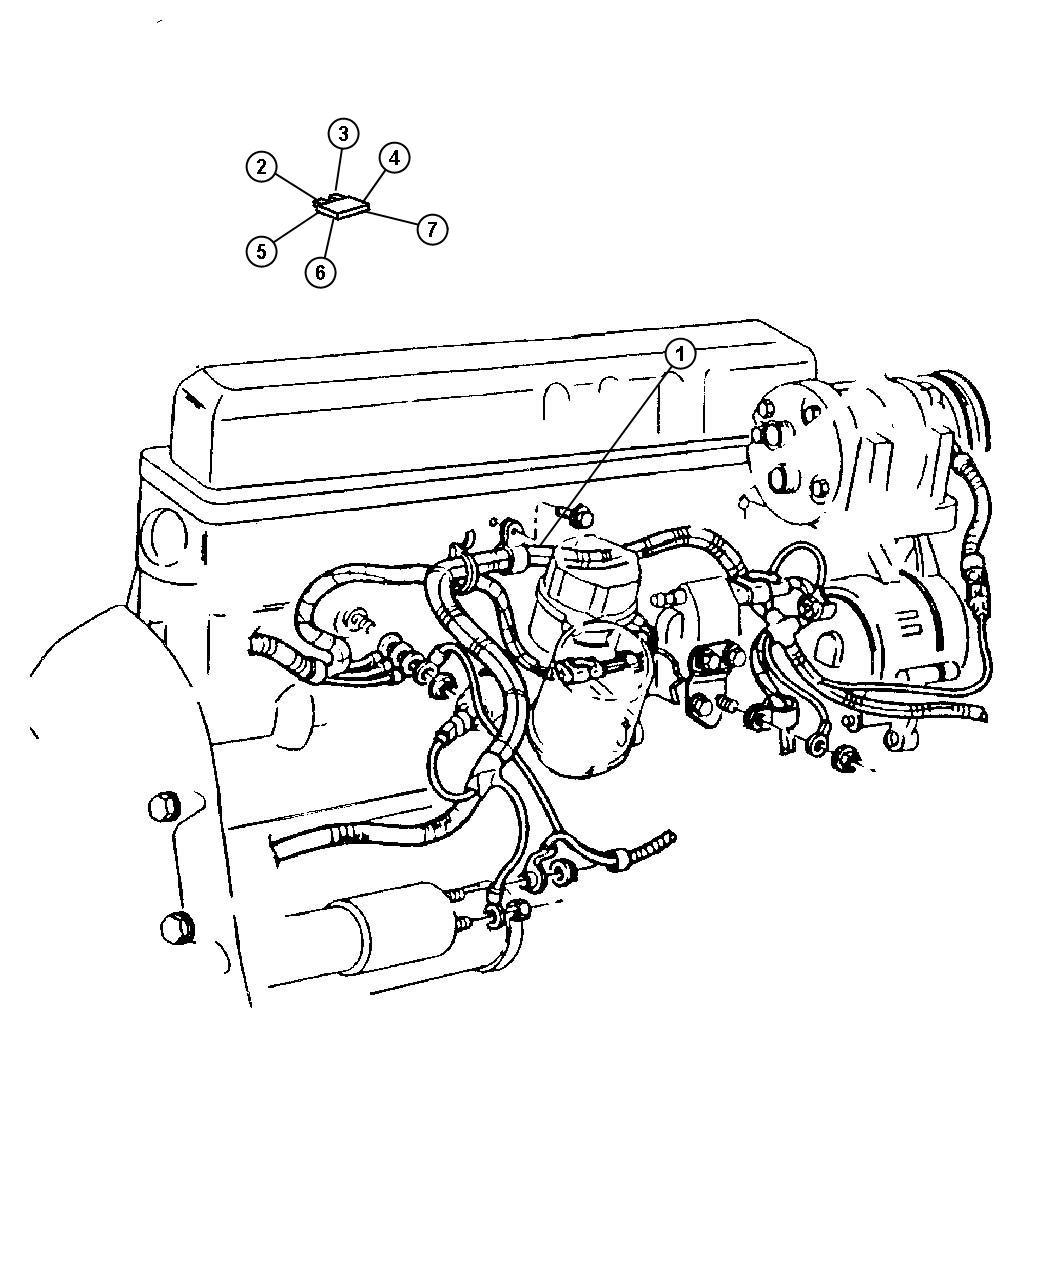 [DOC] Diagram Motors By Jules Bartow Goldvein Power